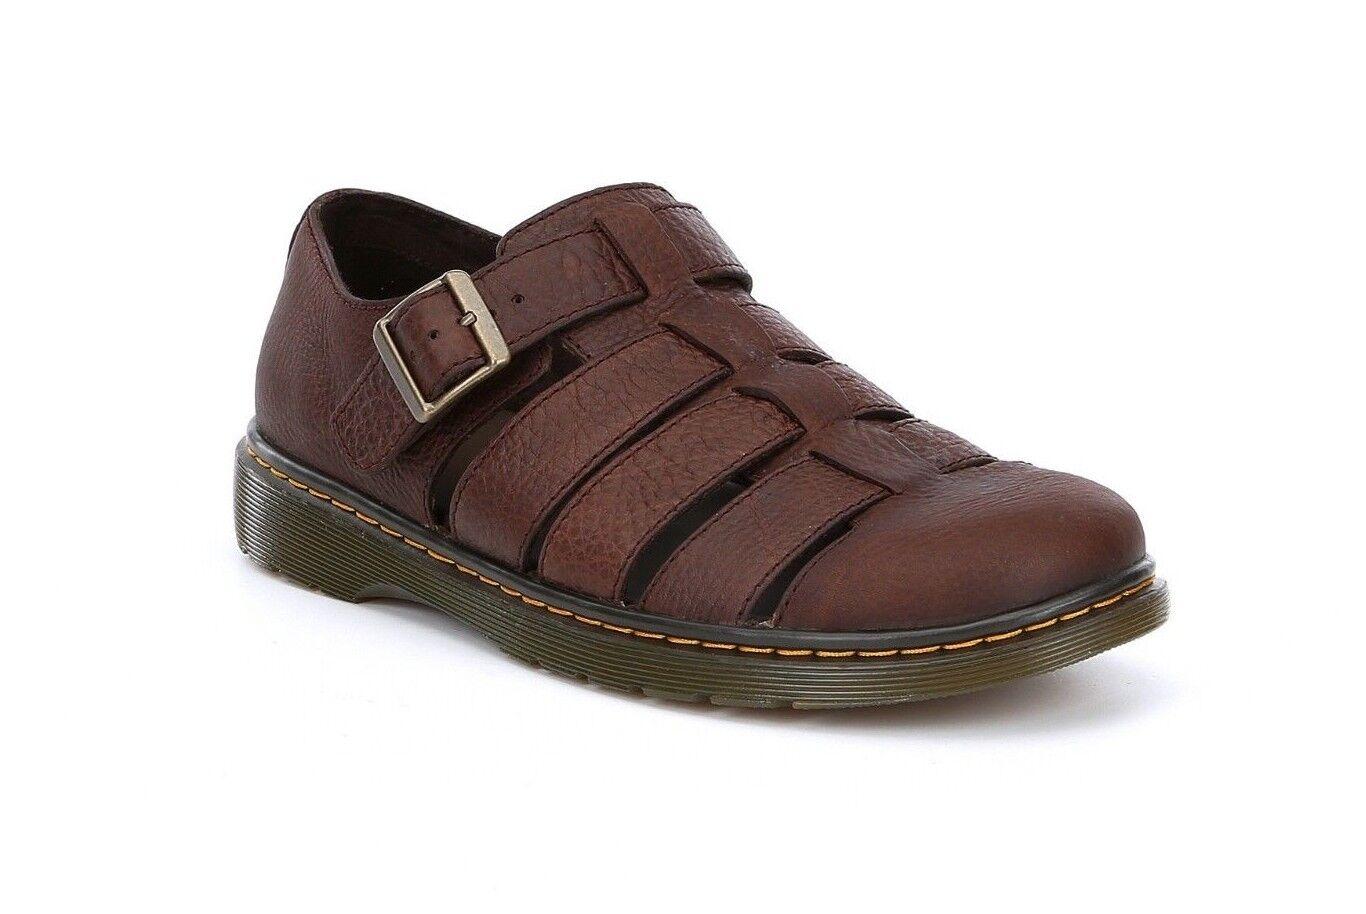 Dr Martens Fenton Men's U.S. Size 11M Brown Leather Fisherman Grunge Sandals New